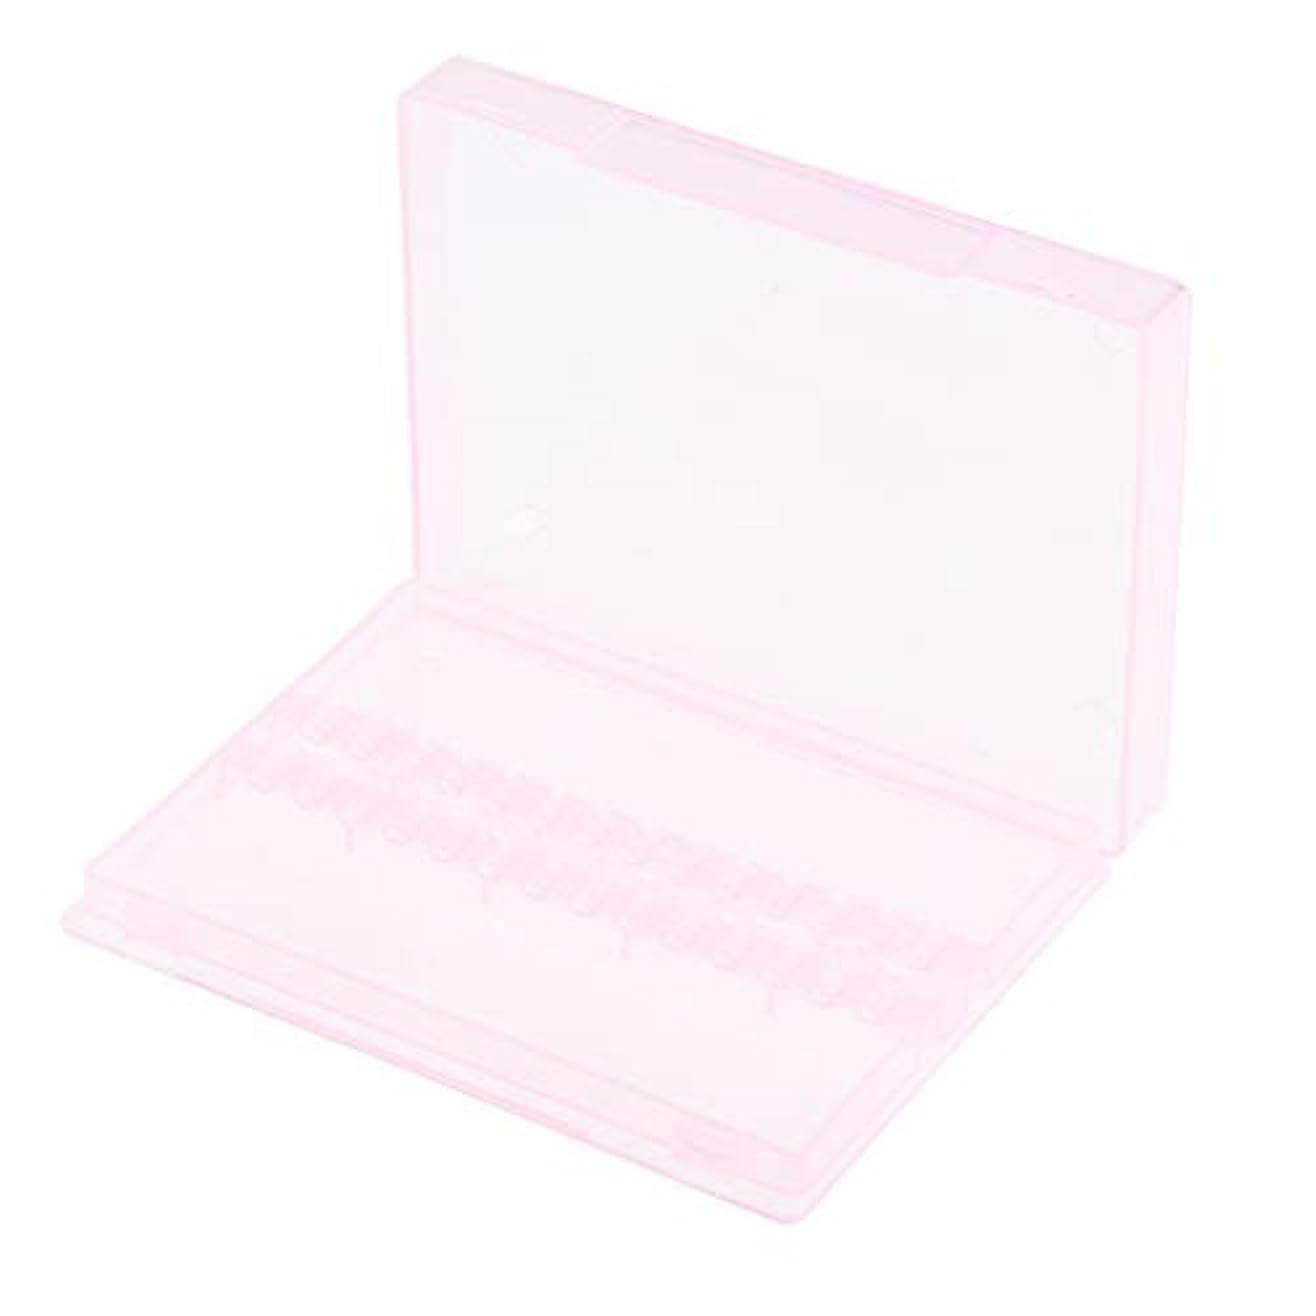 F Fityle ネイルアート ドリルビットホルダー 空ボックス 収納ケース 2色選べ - ピンク